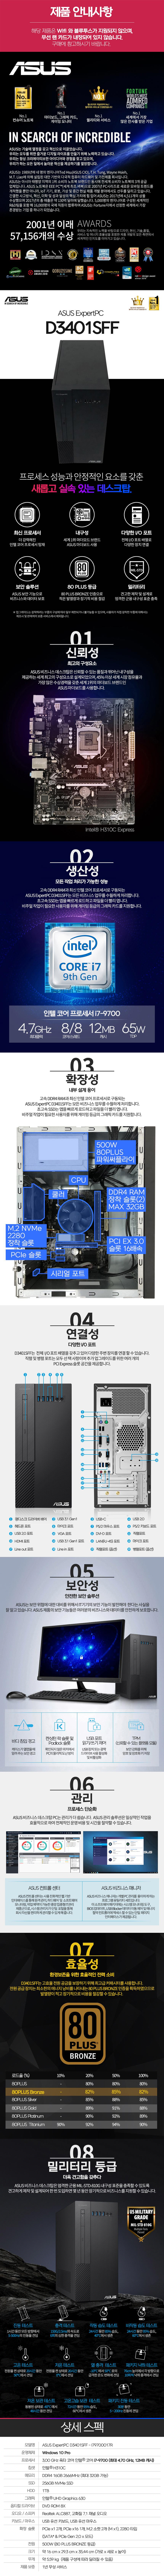 [ASUS] ExpertPC D3401SFF-I79700017R [i7-9700/RAM 16GB/NVMe 256GB/Windows 10 Pro]